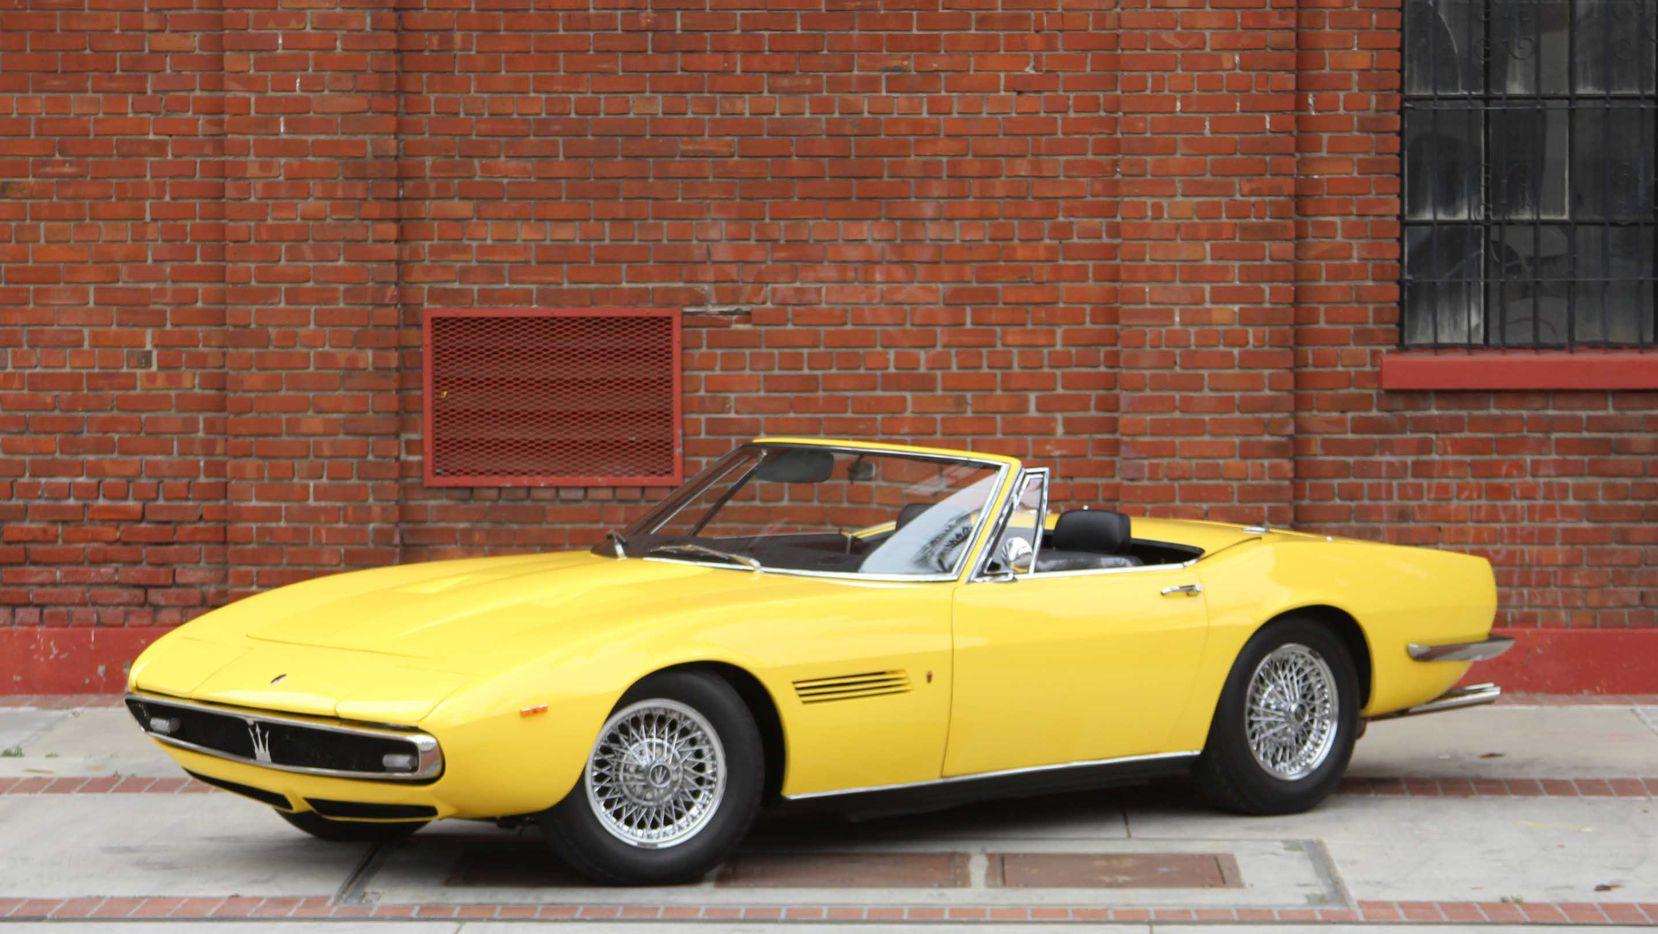 Lot S107.1 1969 Maserati Ghibli 4.9 Spyder (Mecum)